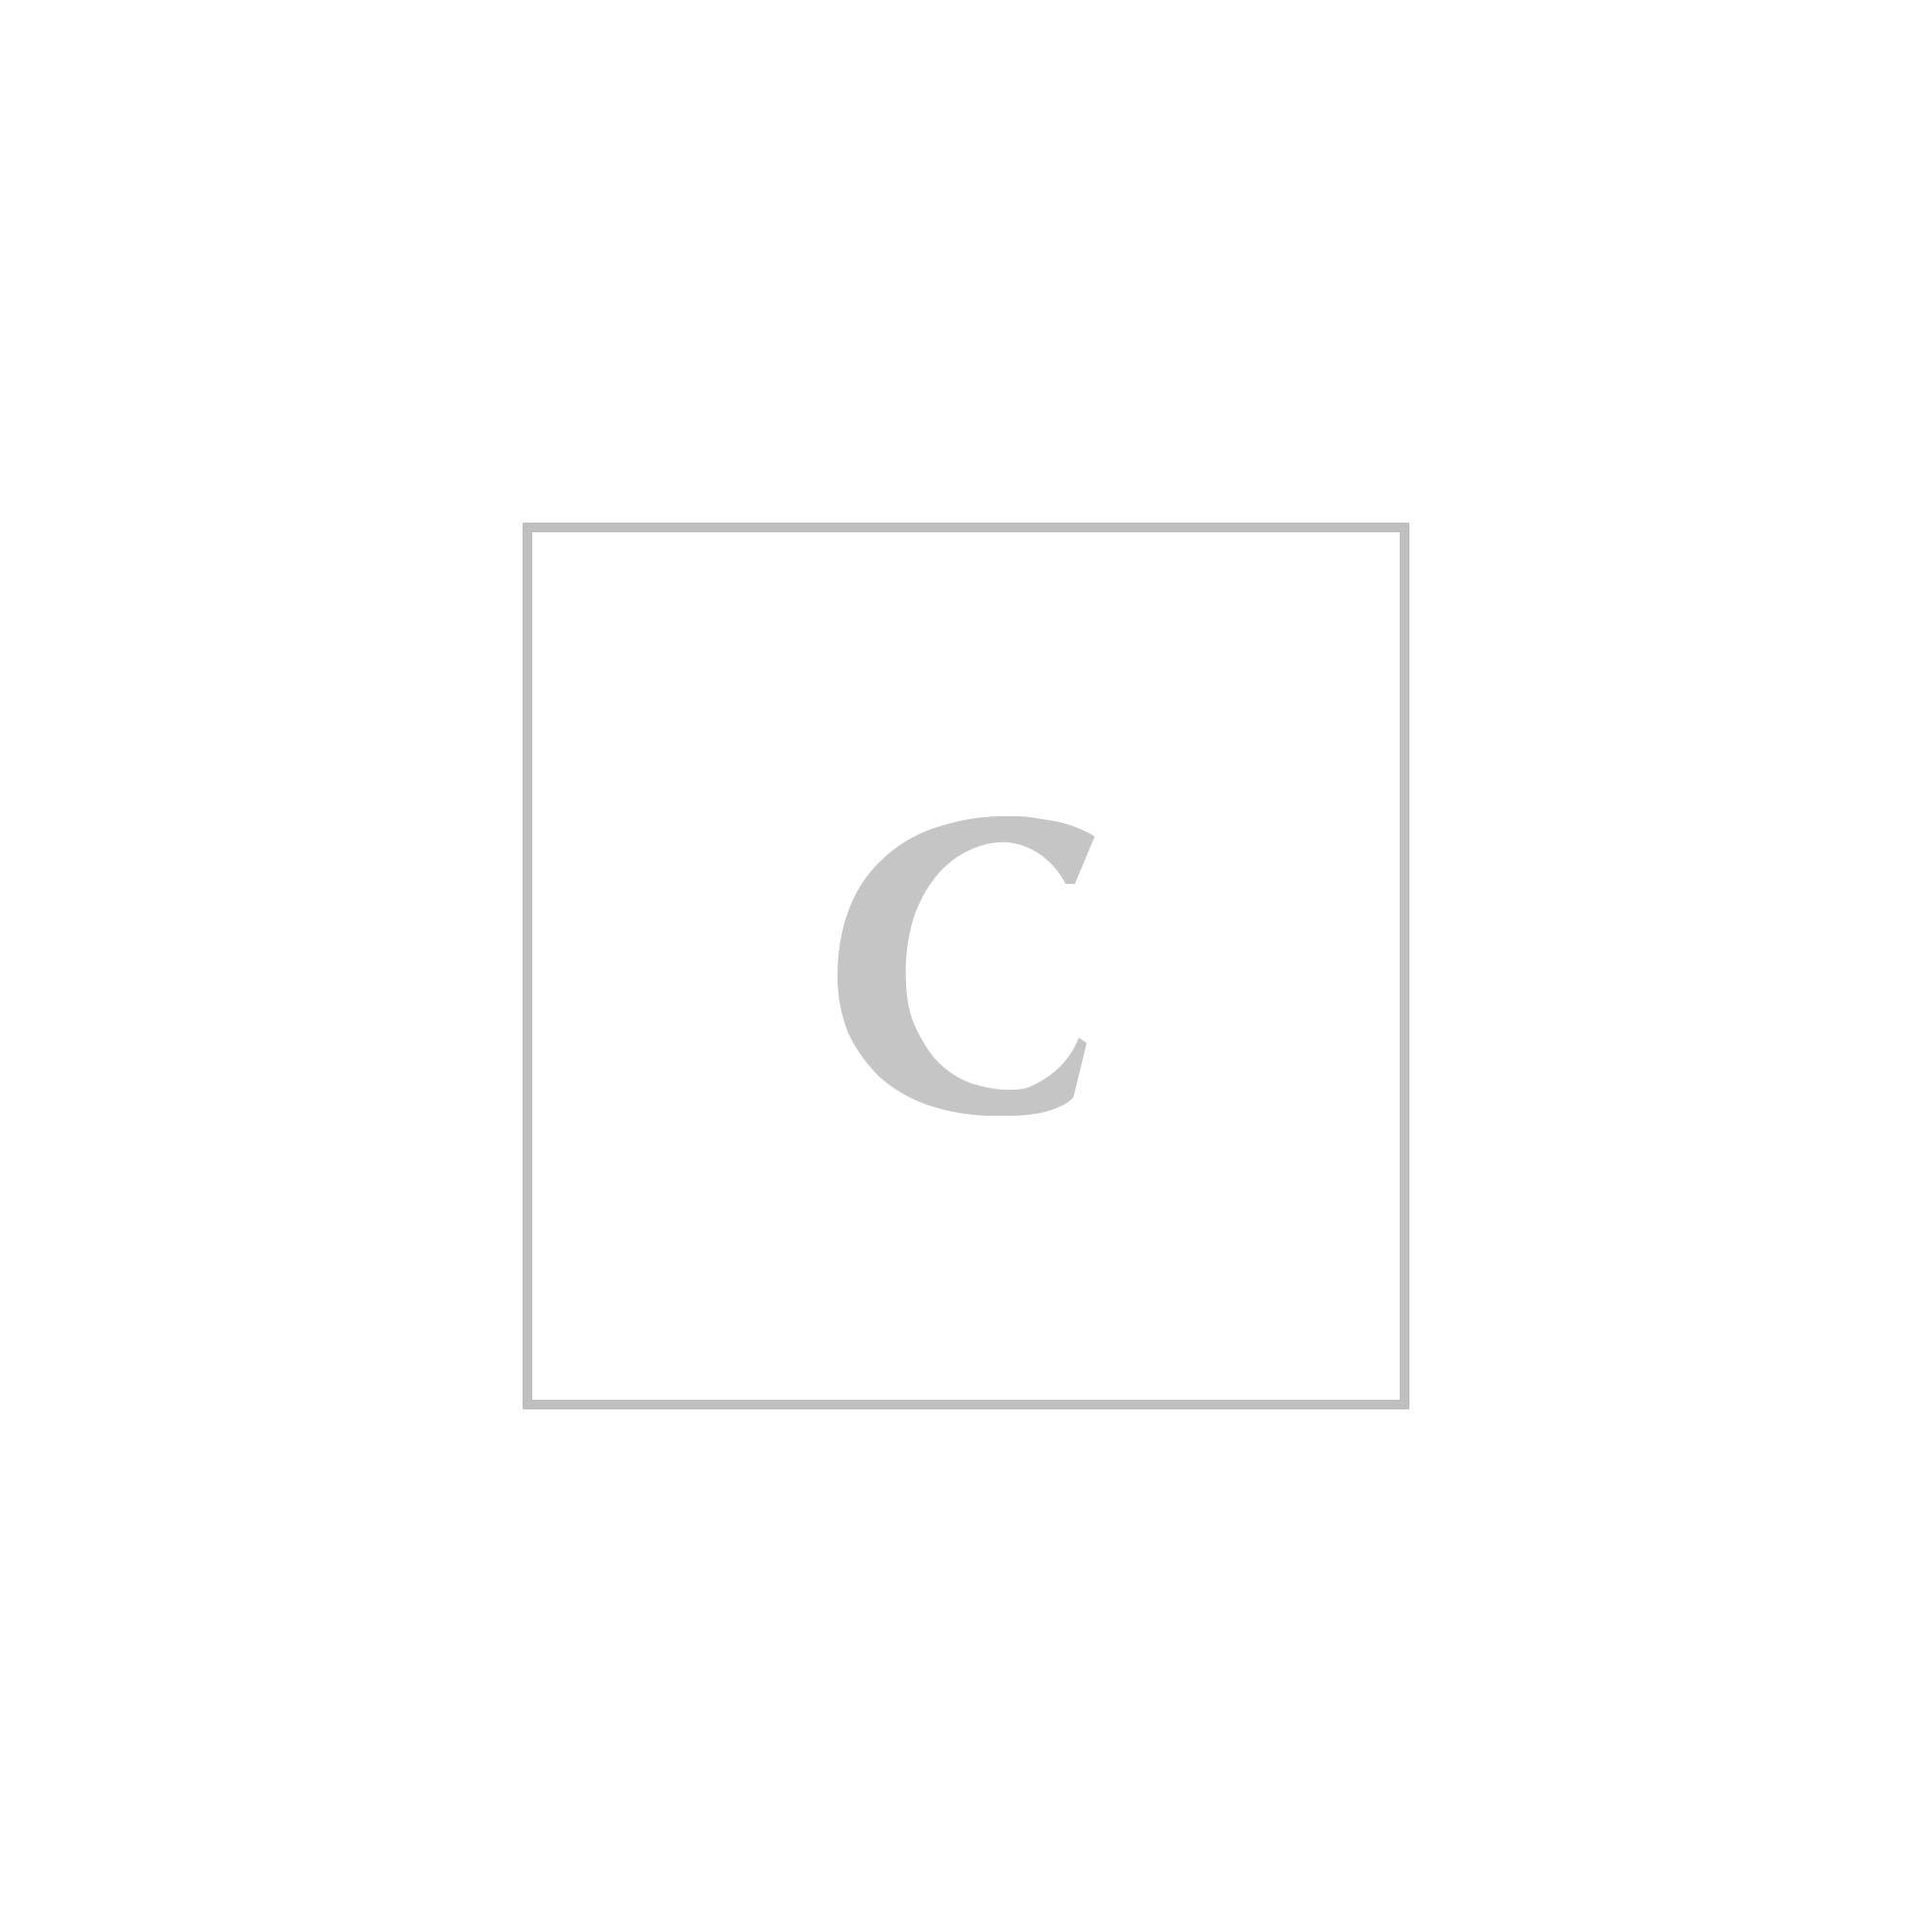 Saint laurent ysl grain monogram clutch